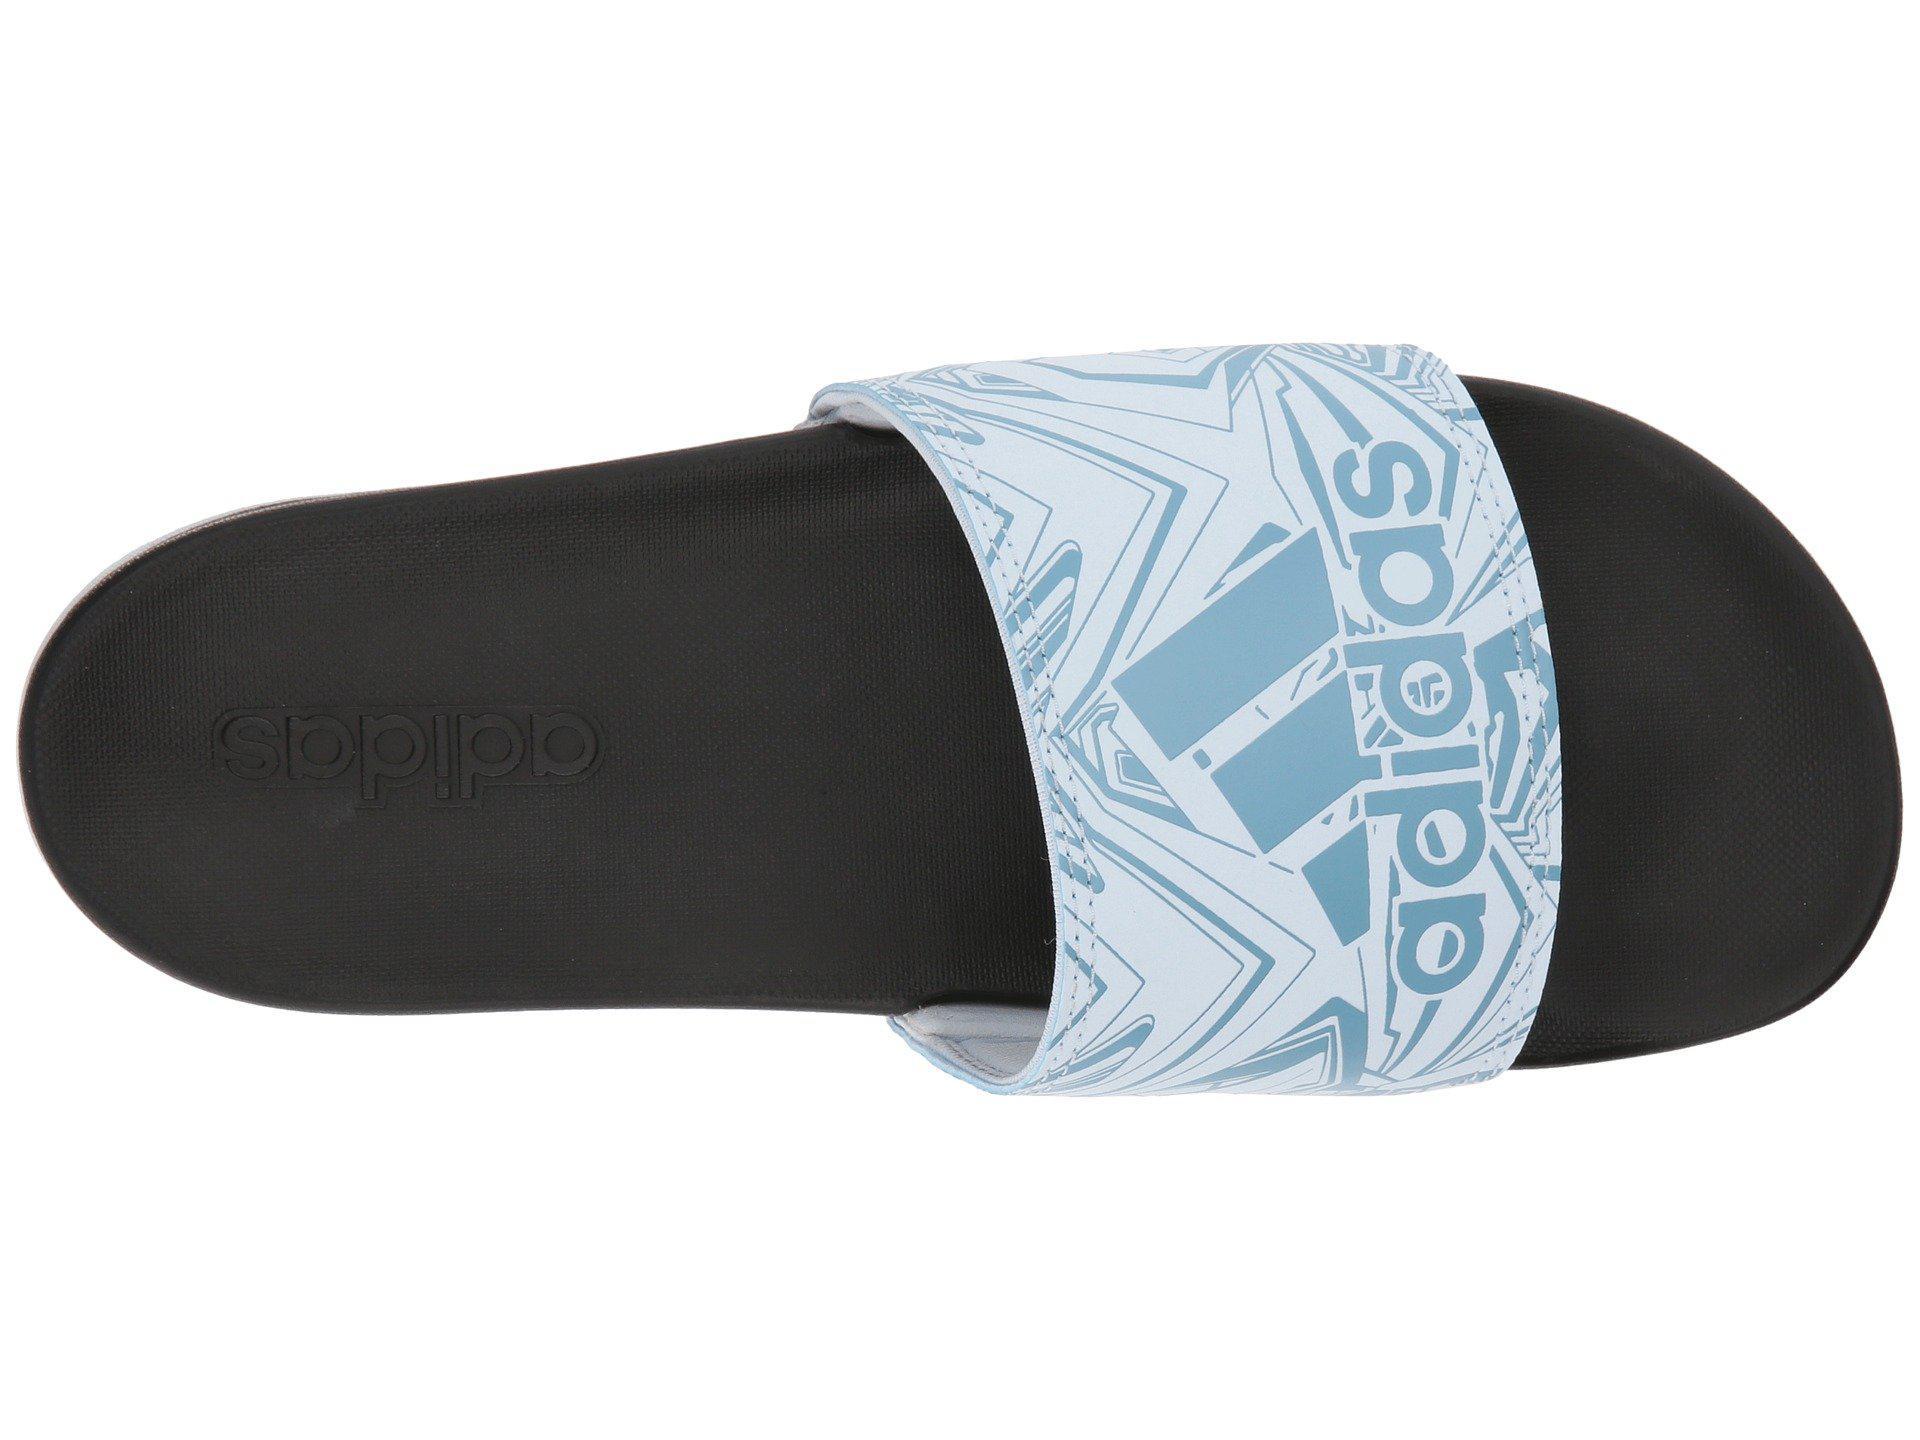 official photos 8c76c 38c67 View fullscreen  separation shoes 9dc98 680df Adidas - Blue Adilette Cf+ Gr  - Lyst. View fullscreen